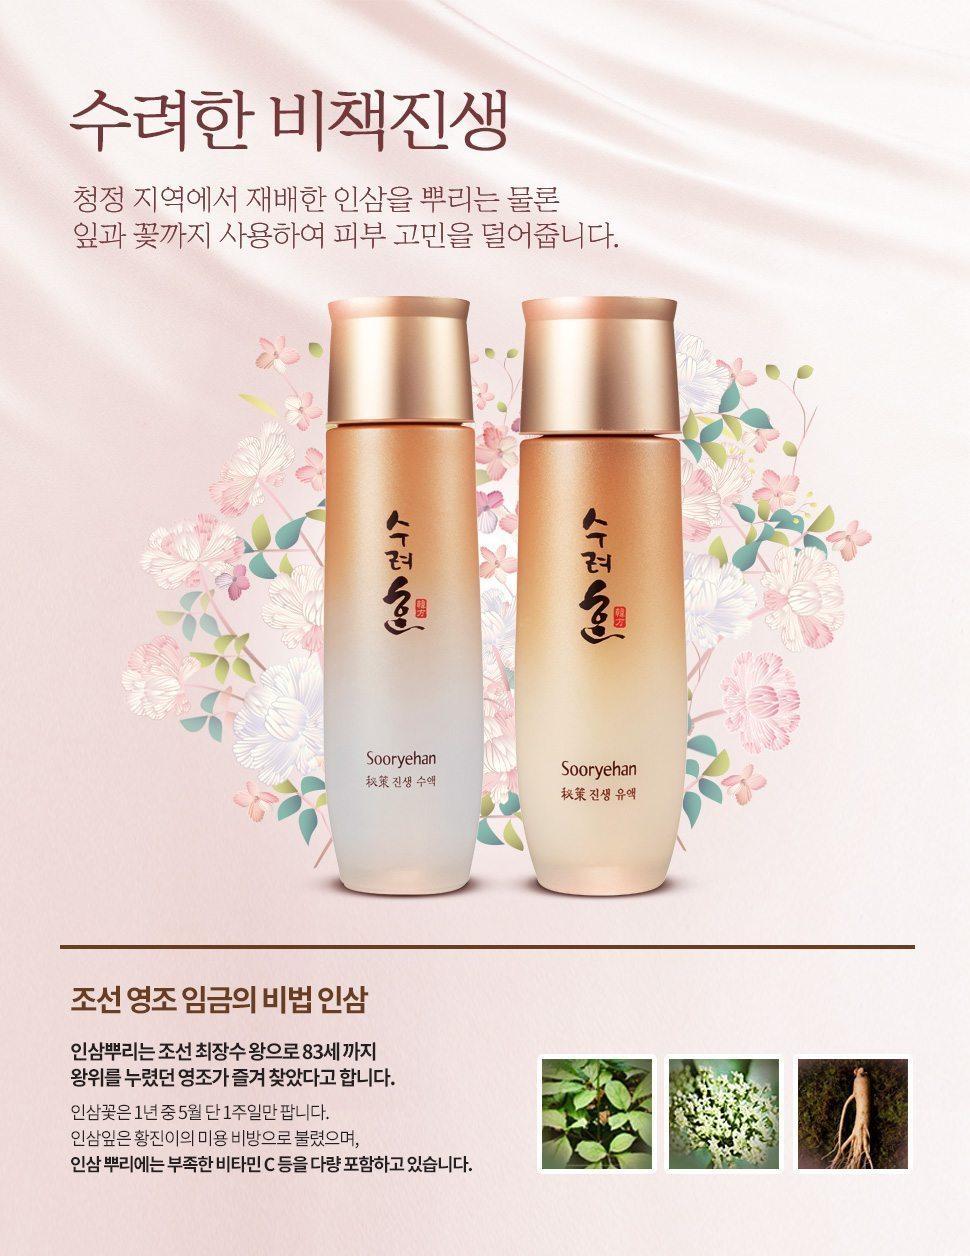 Sooryehan Bichaek Ginseng Emulsion 130ml malaysia singapore indonesia